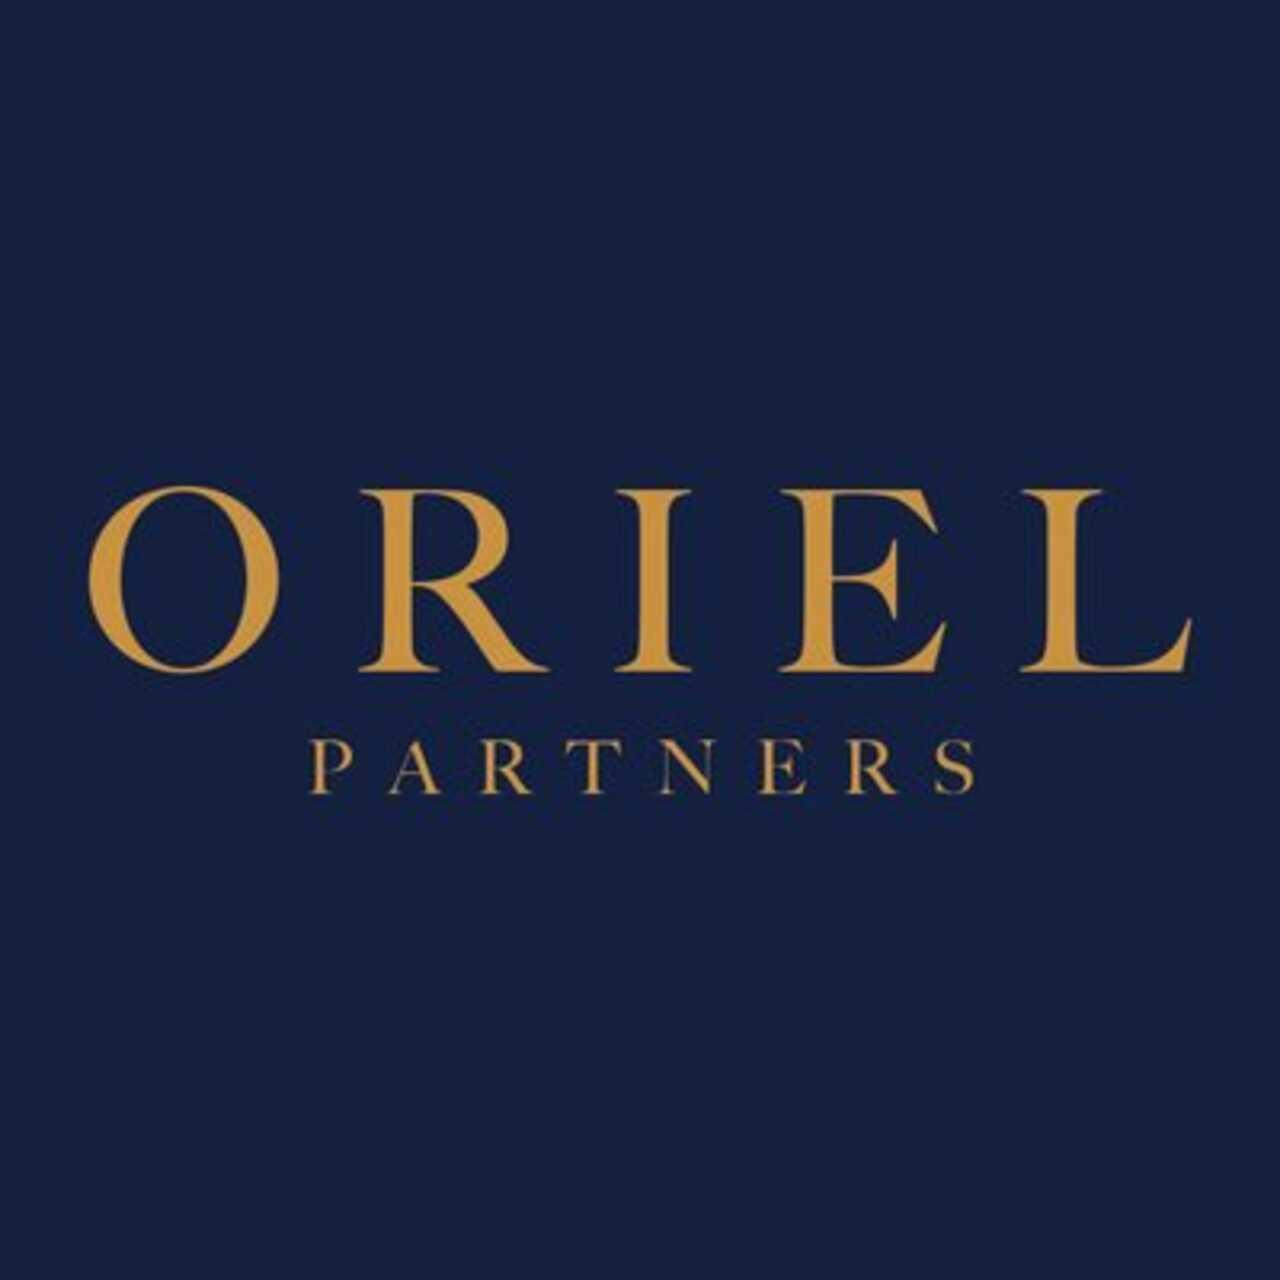 Oriel Partners - Services - Employment Services in London